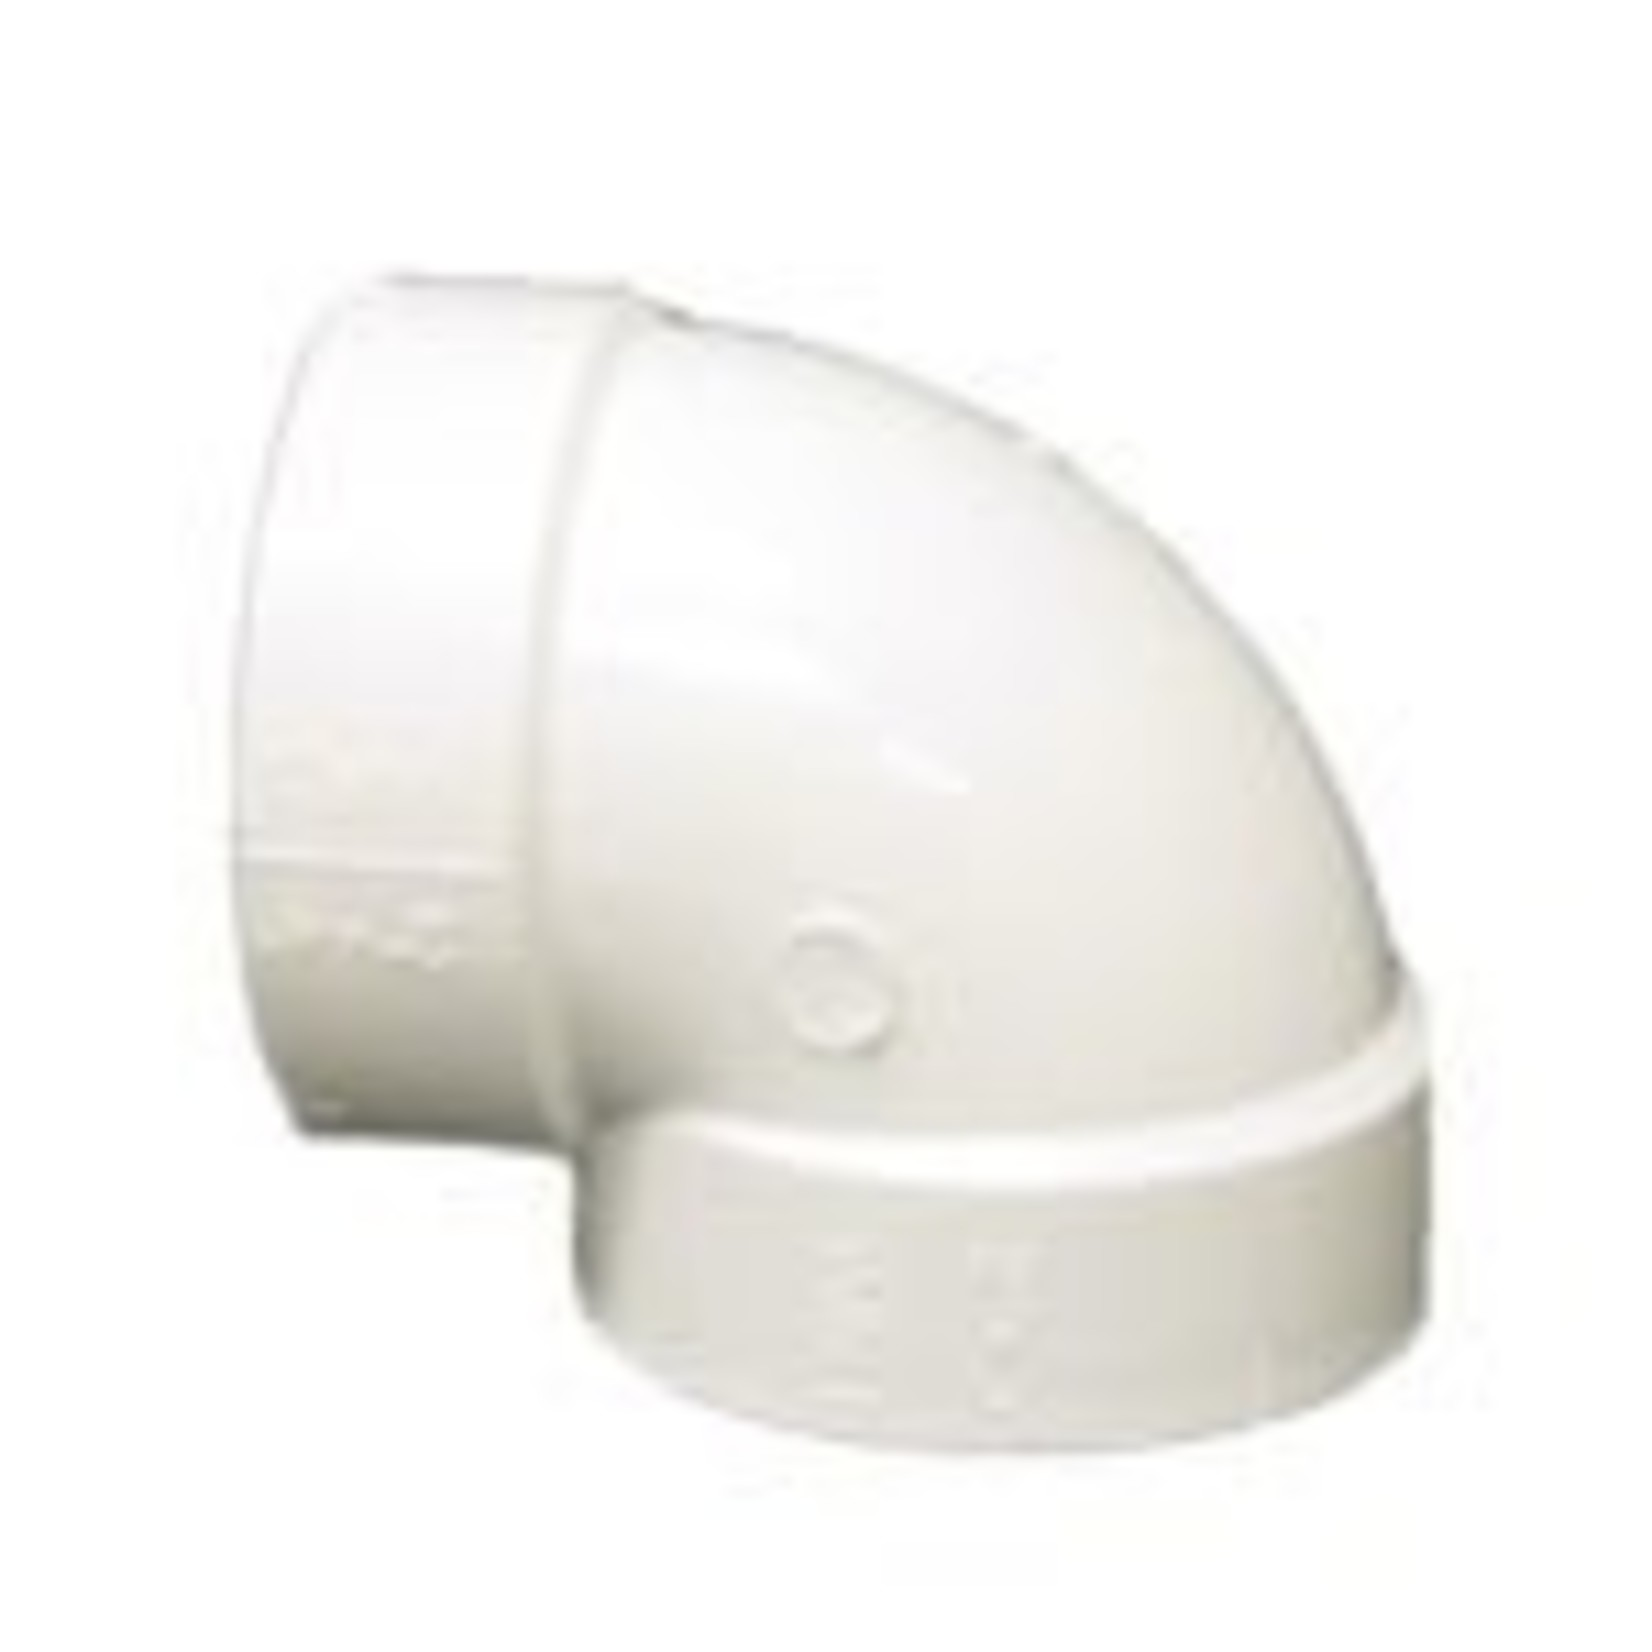 Plastiflex Central Vacuum Sharp 90 Elbow Fitting - Single